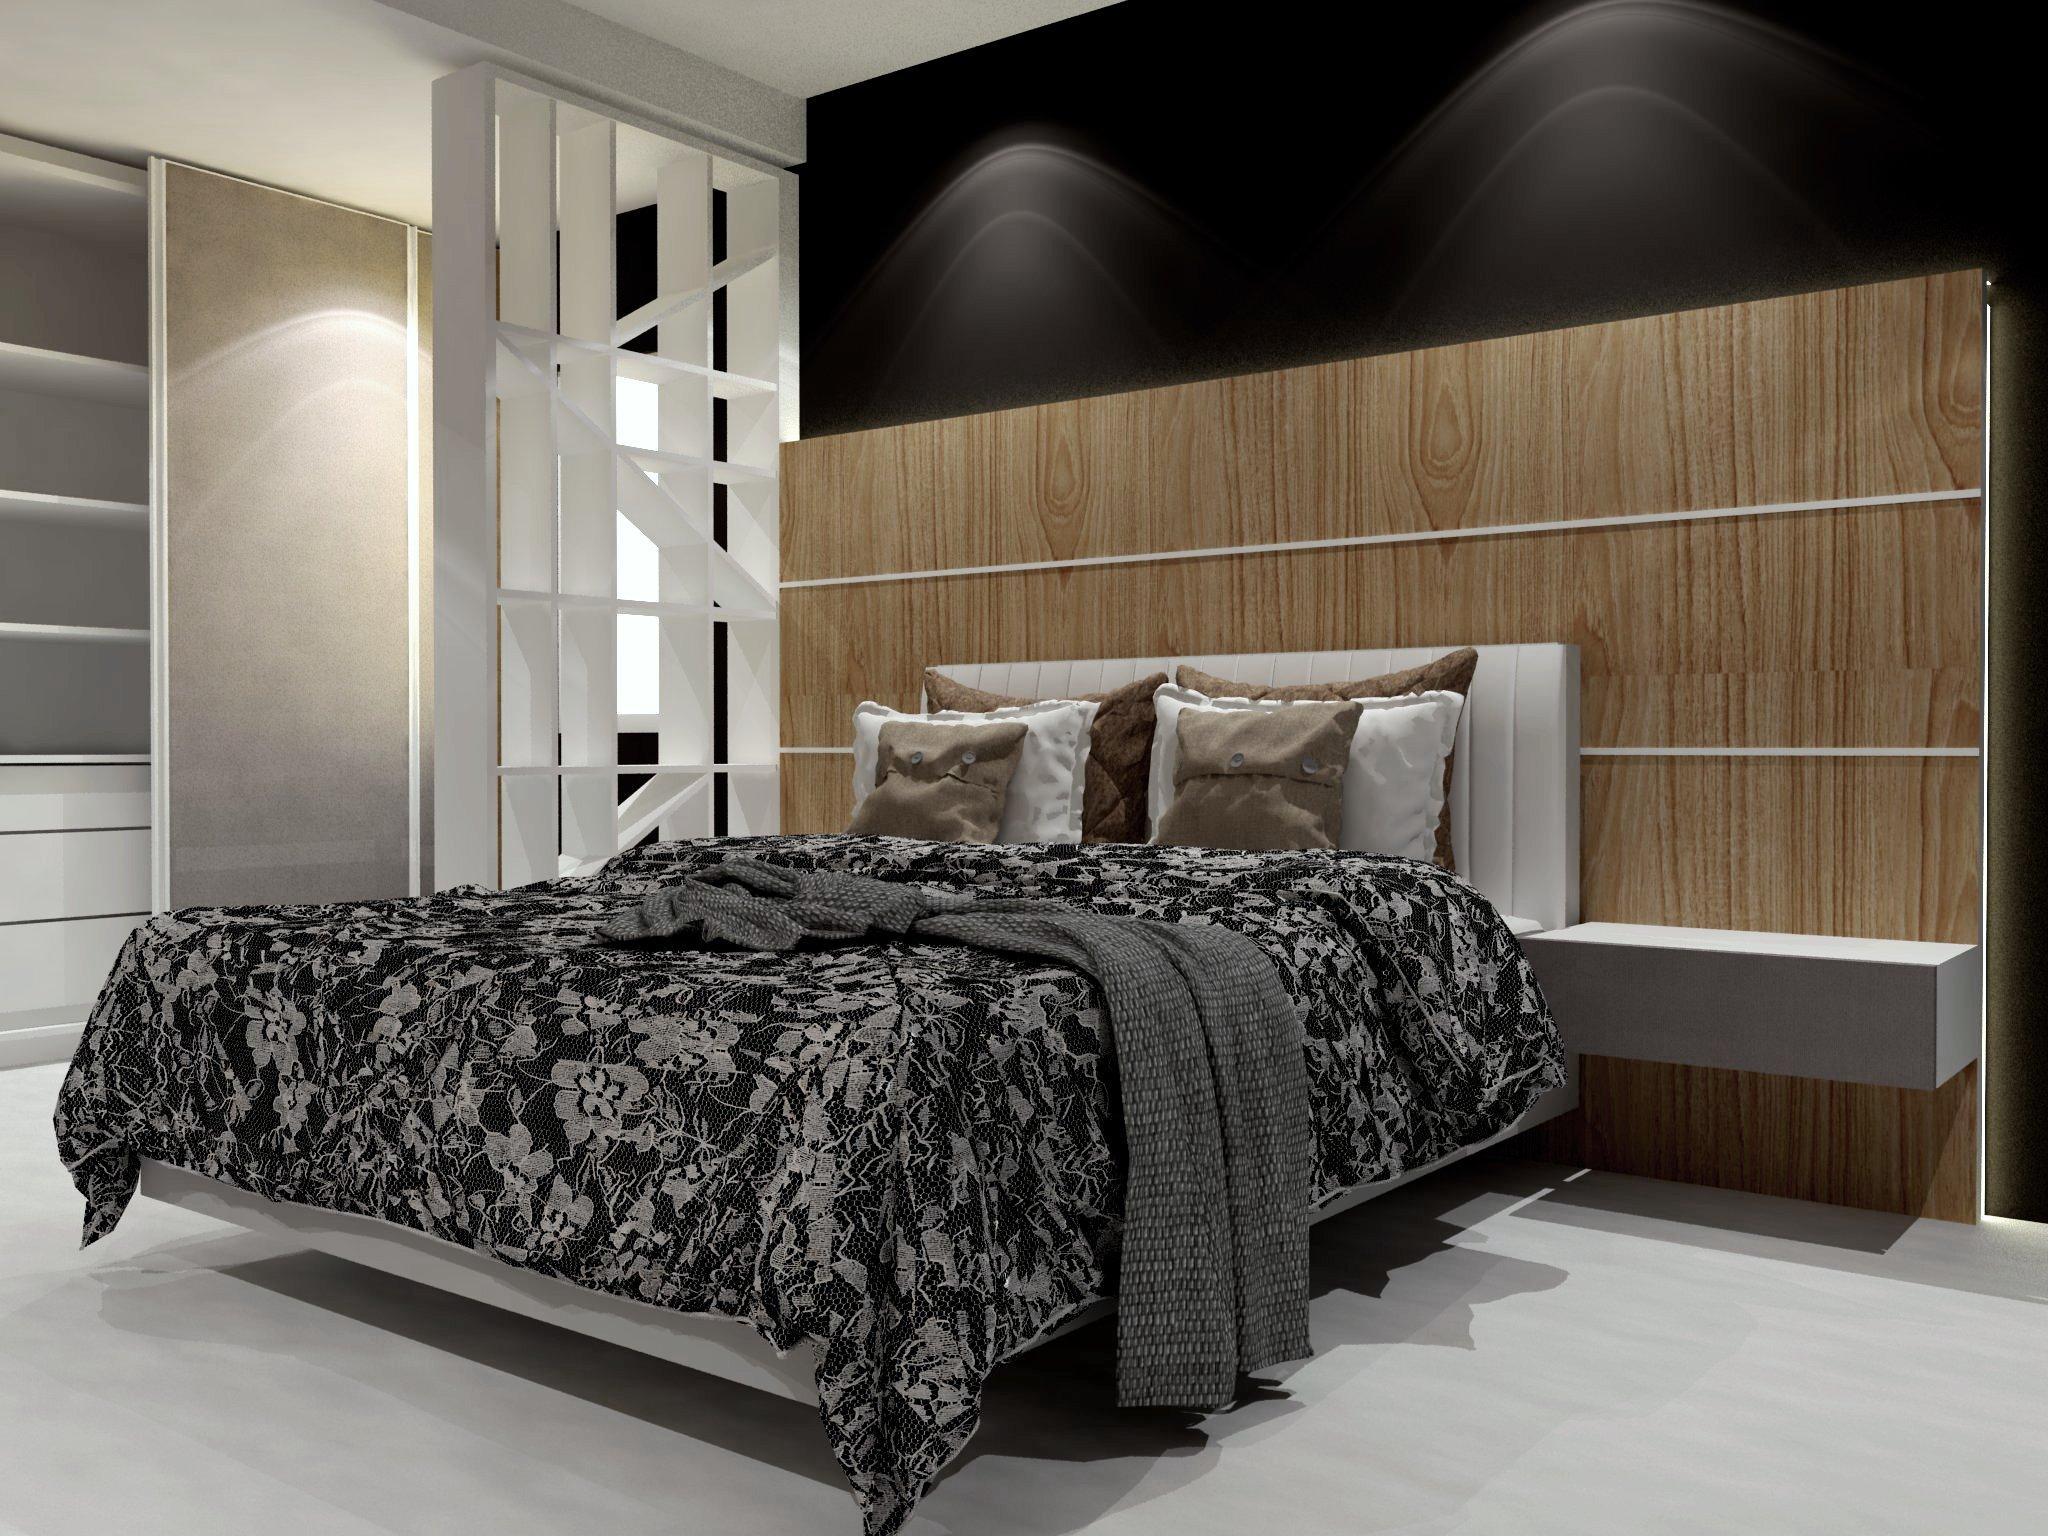 bedroom set interior design di pantai indah kapuk, PIK, jakarta utara